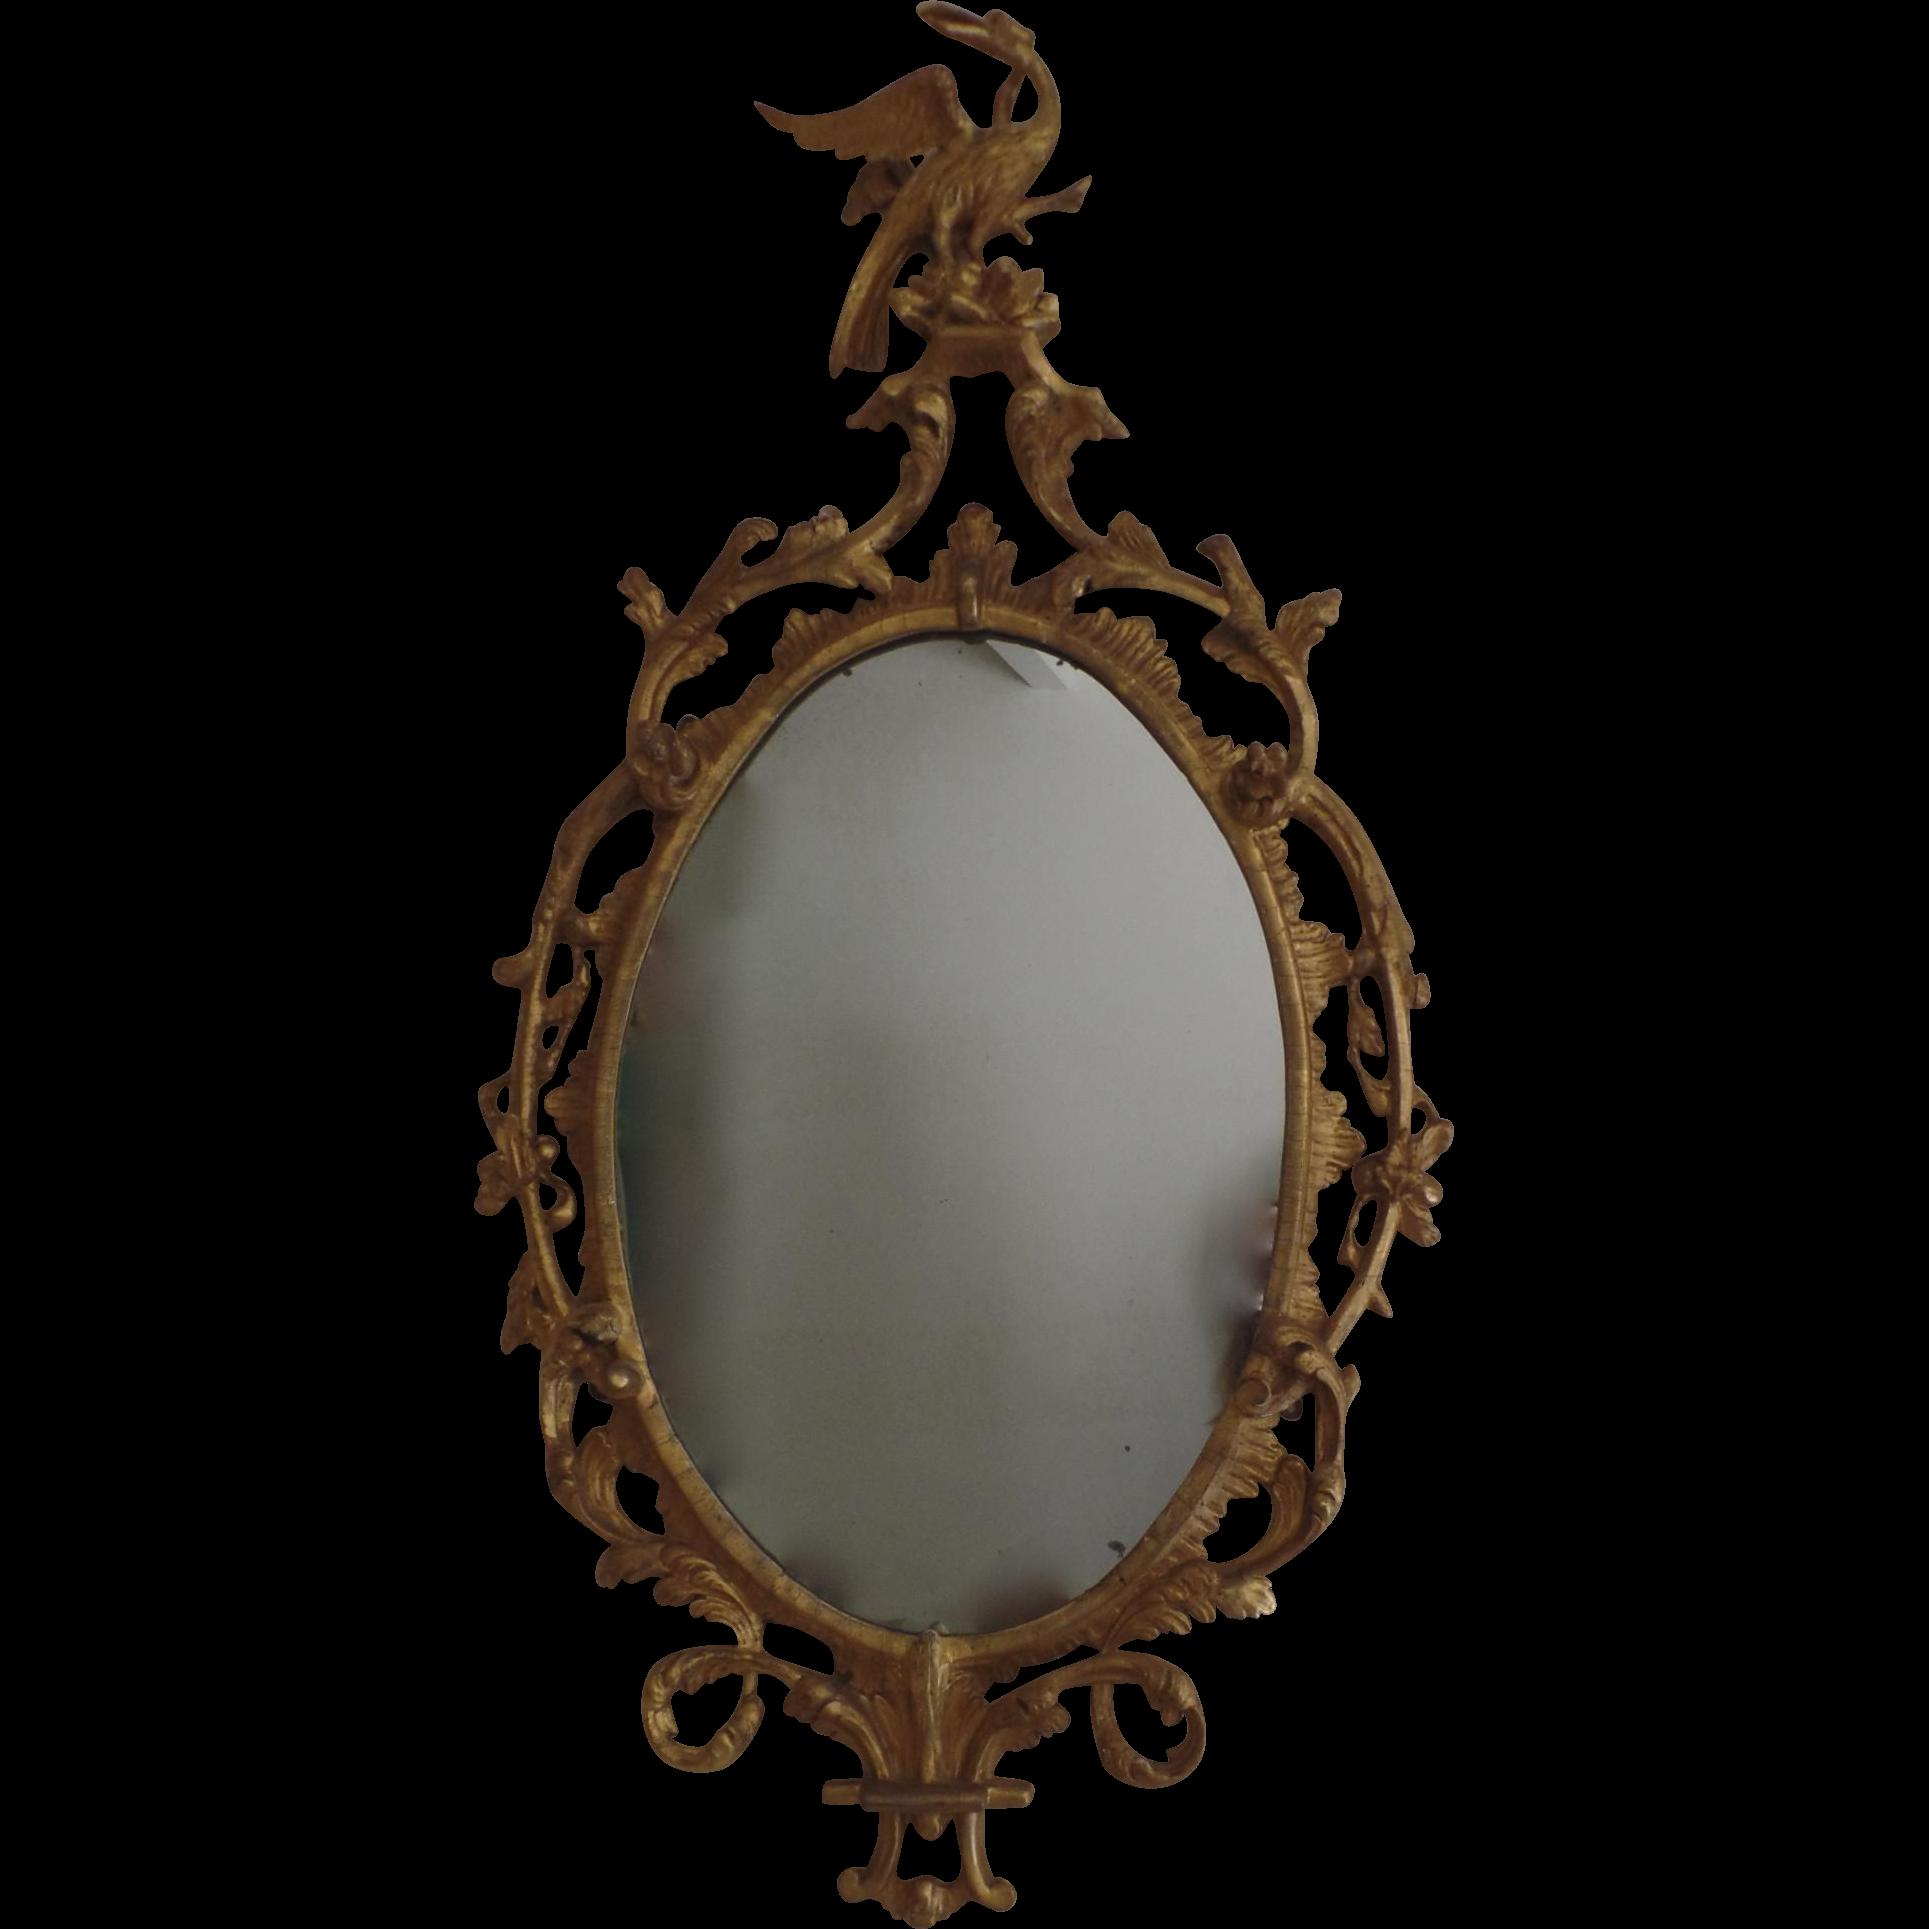 English Georgian Gilt Oval Mirror 19th Century